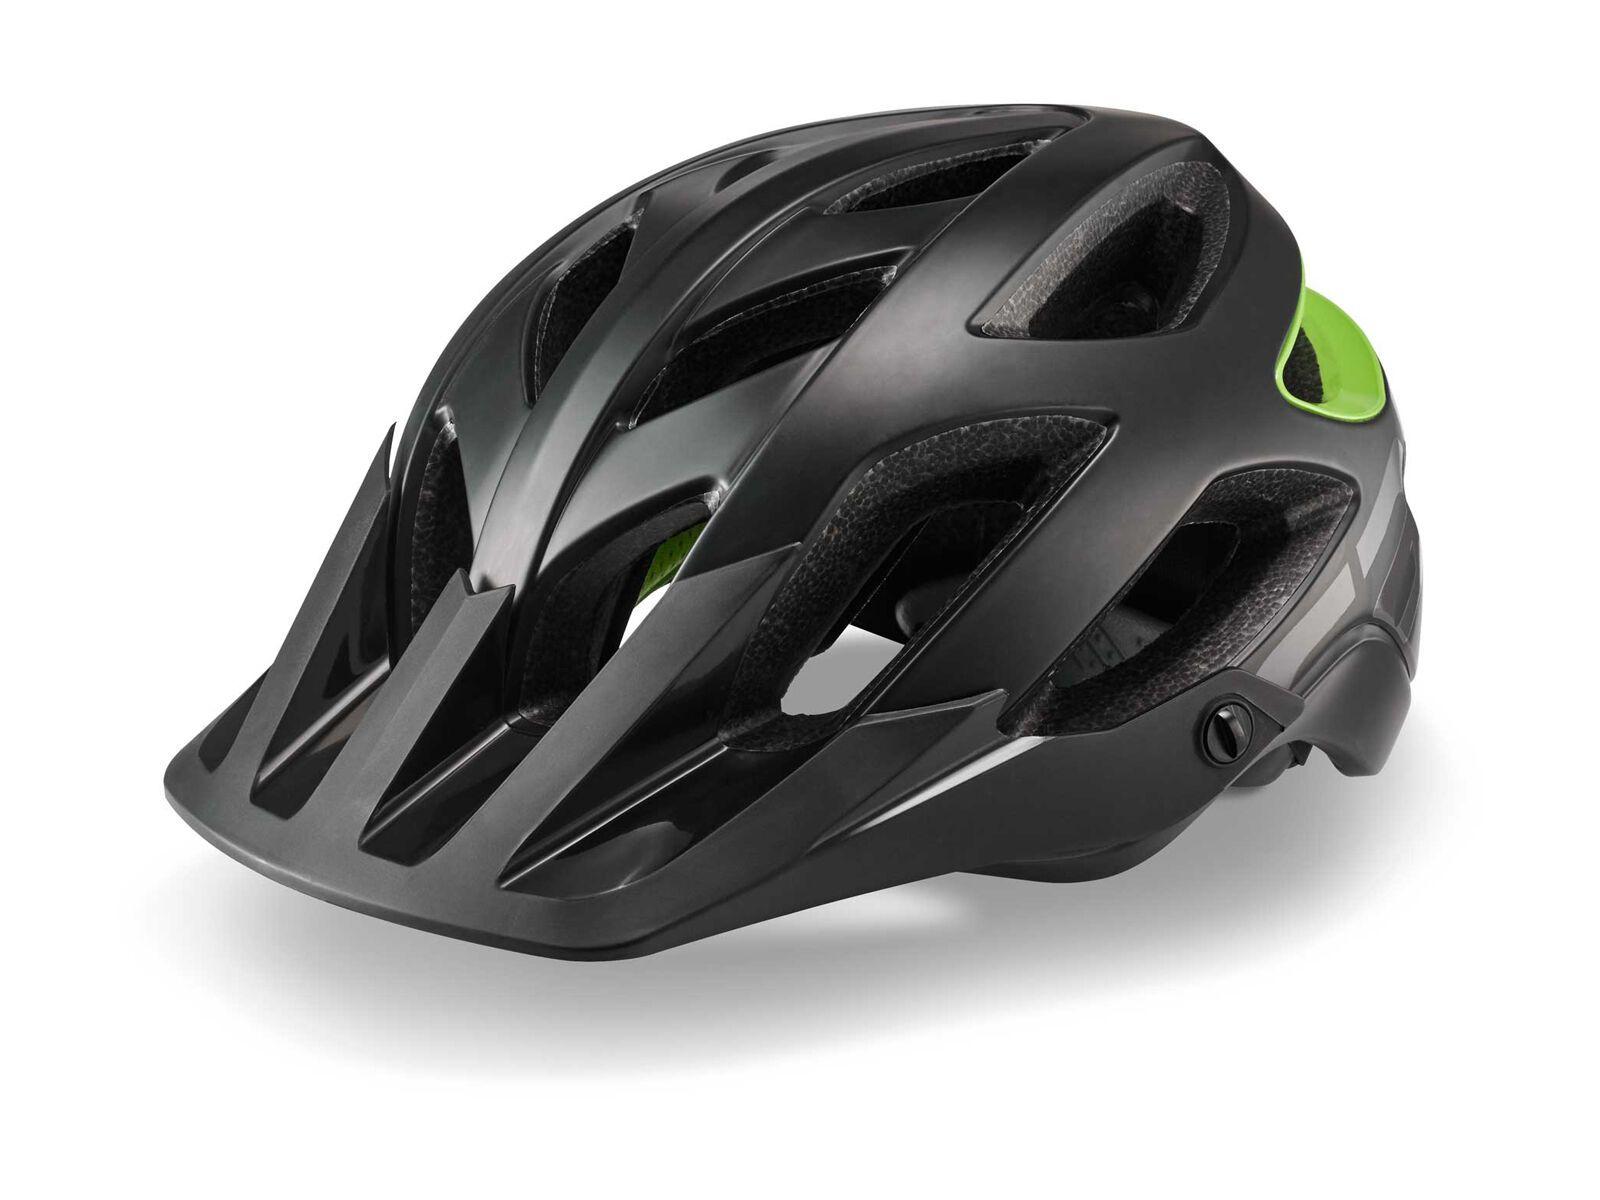 Cannondale Ryker MIPS, black/green - Fahrradhelm, Größe S // 51-55 cm CH4907U10SM